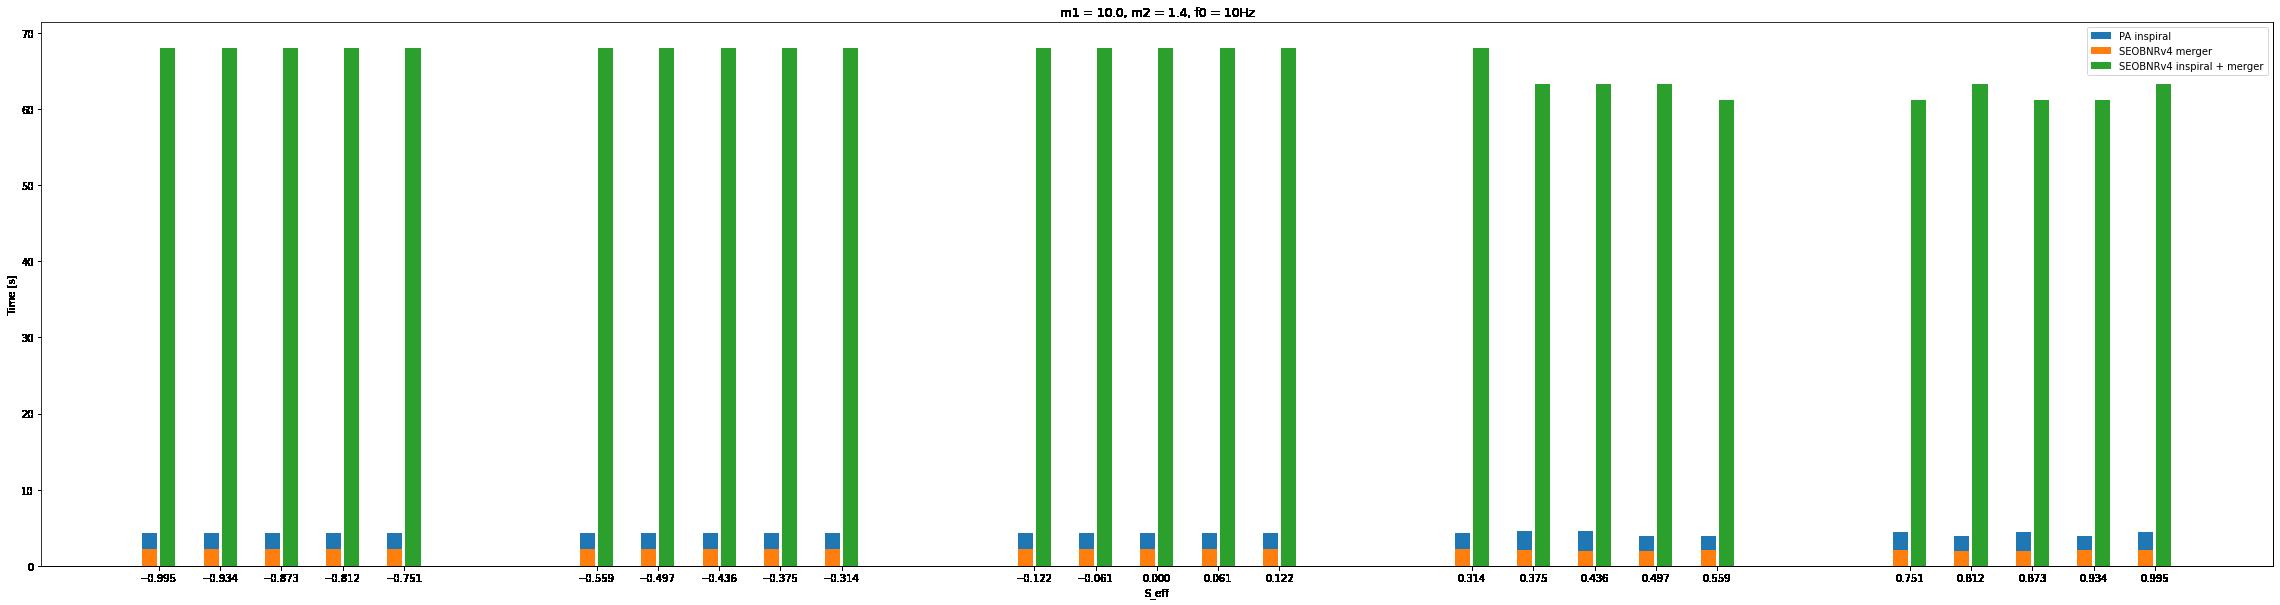 plots/m1_10_bar_plot.png